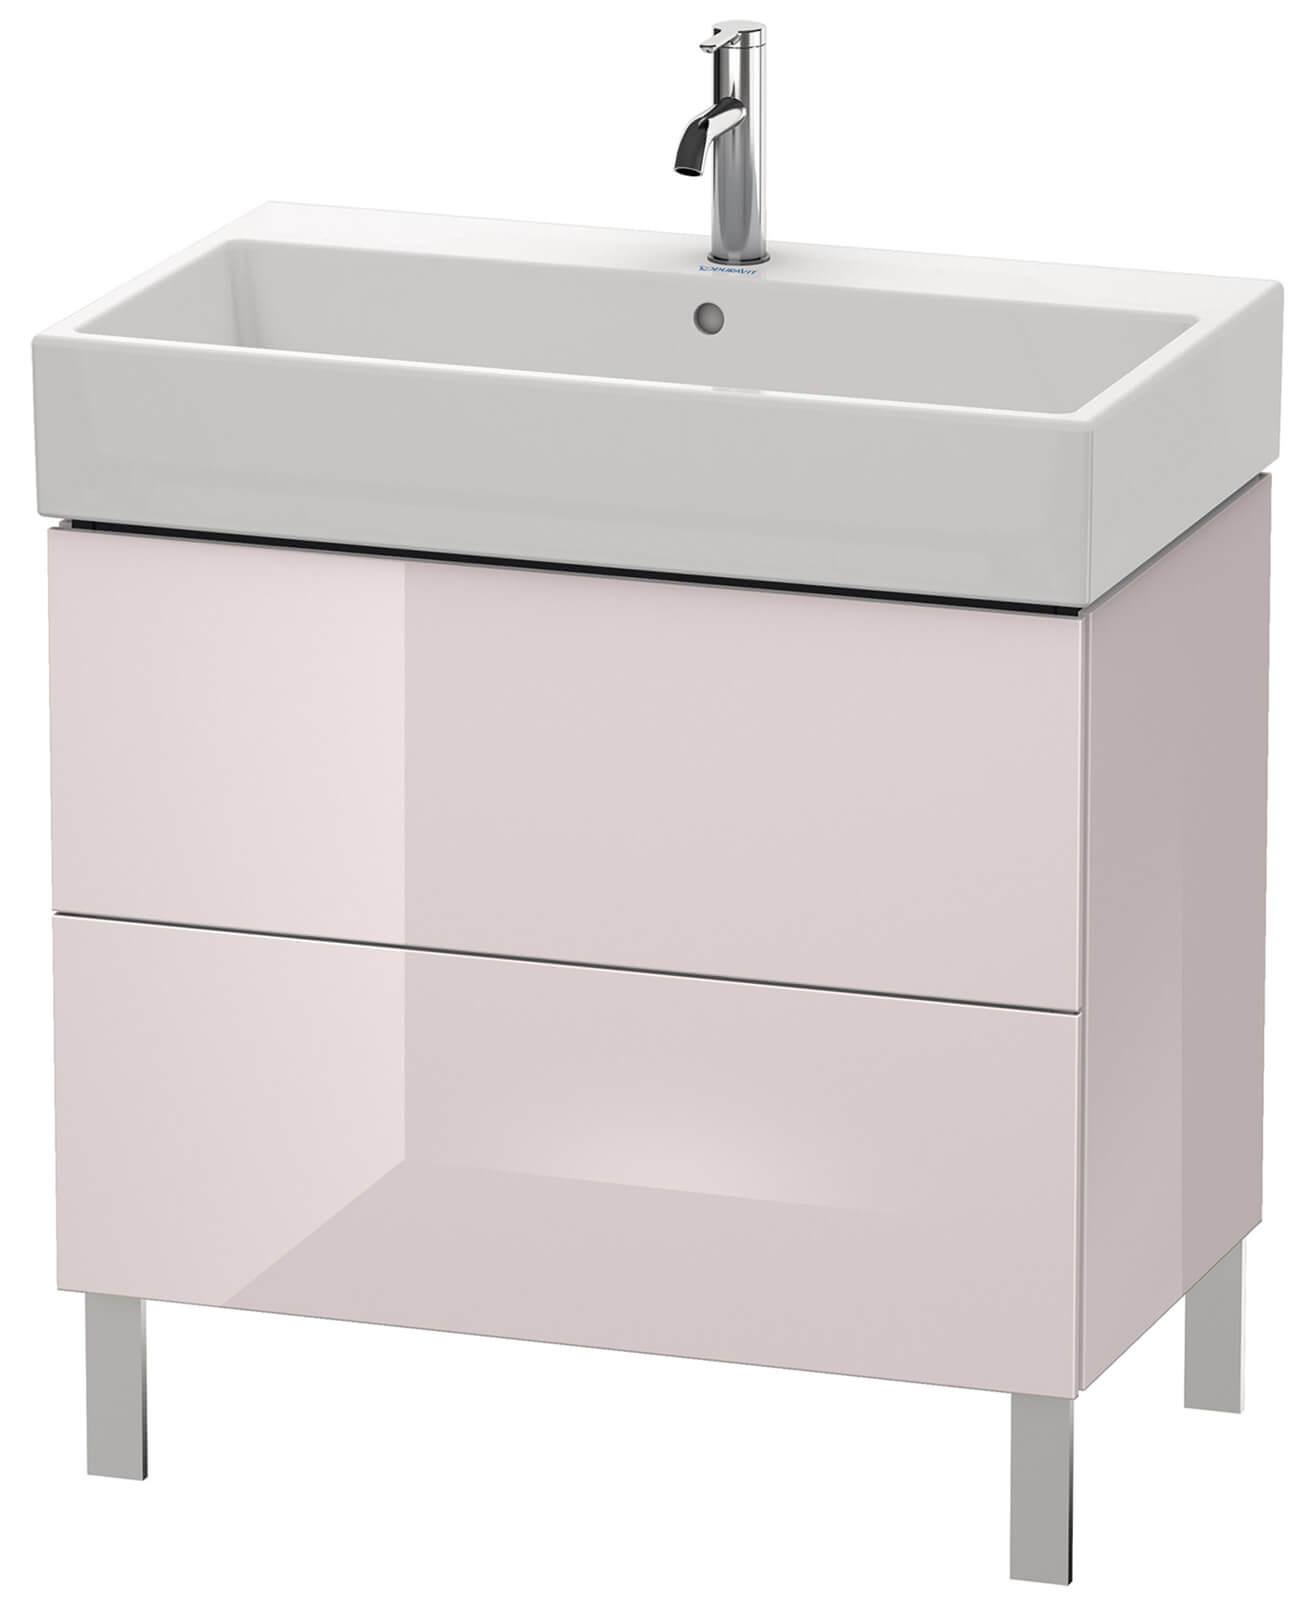 duravit l cube 784mm floor standing vanity unit with vero air basin. Black Bedroom Furniture Sets. Home Design Ideas